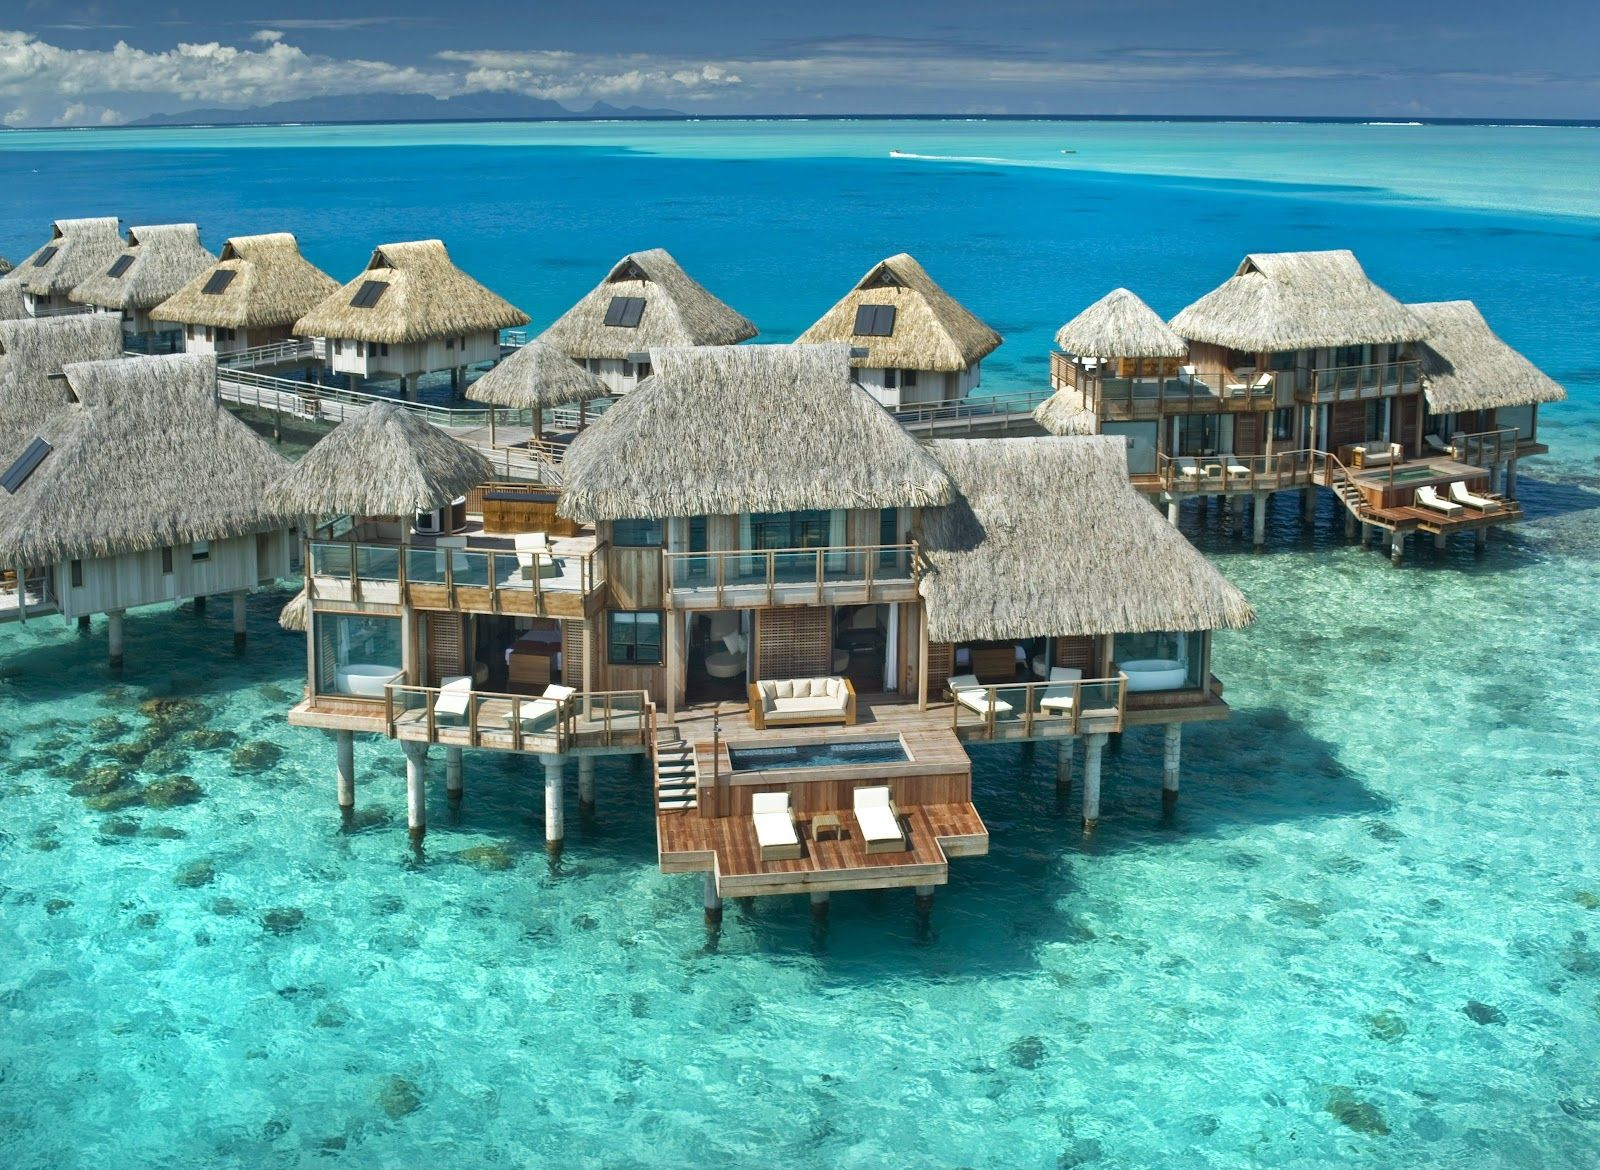 Amazing Things in the World Hilton Bora